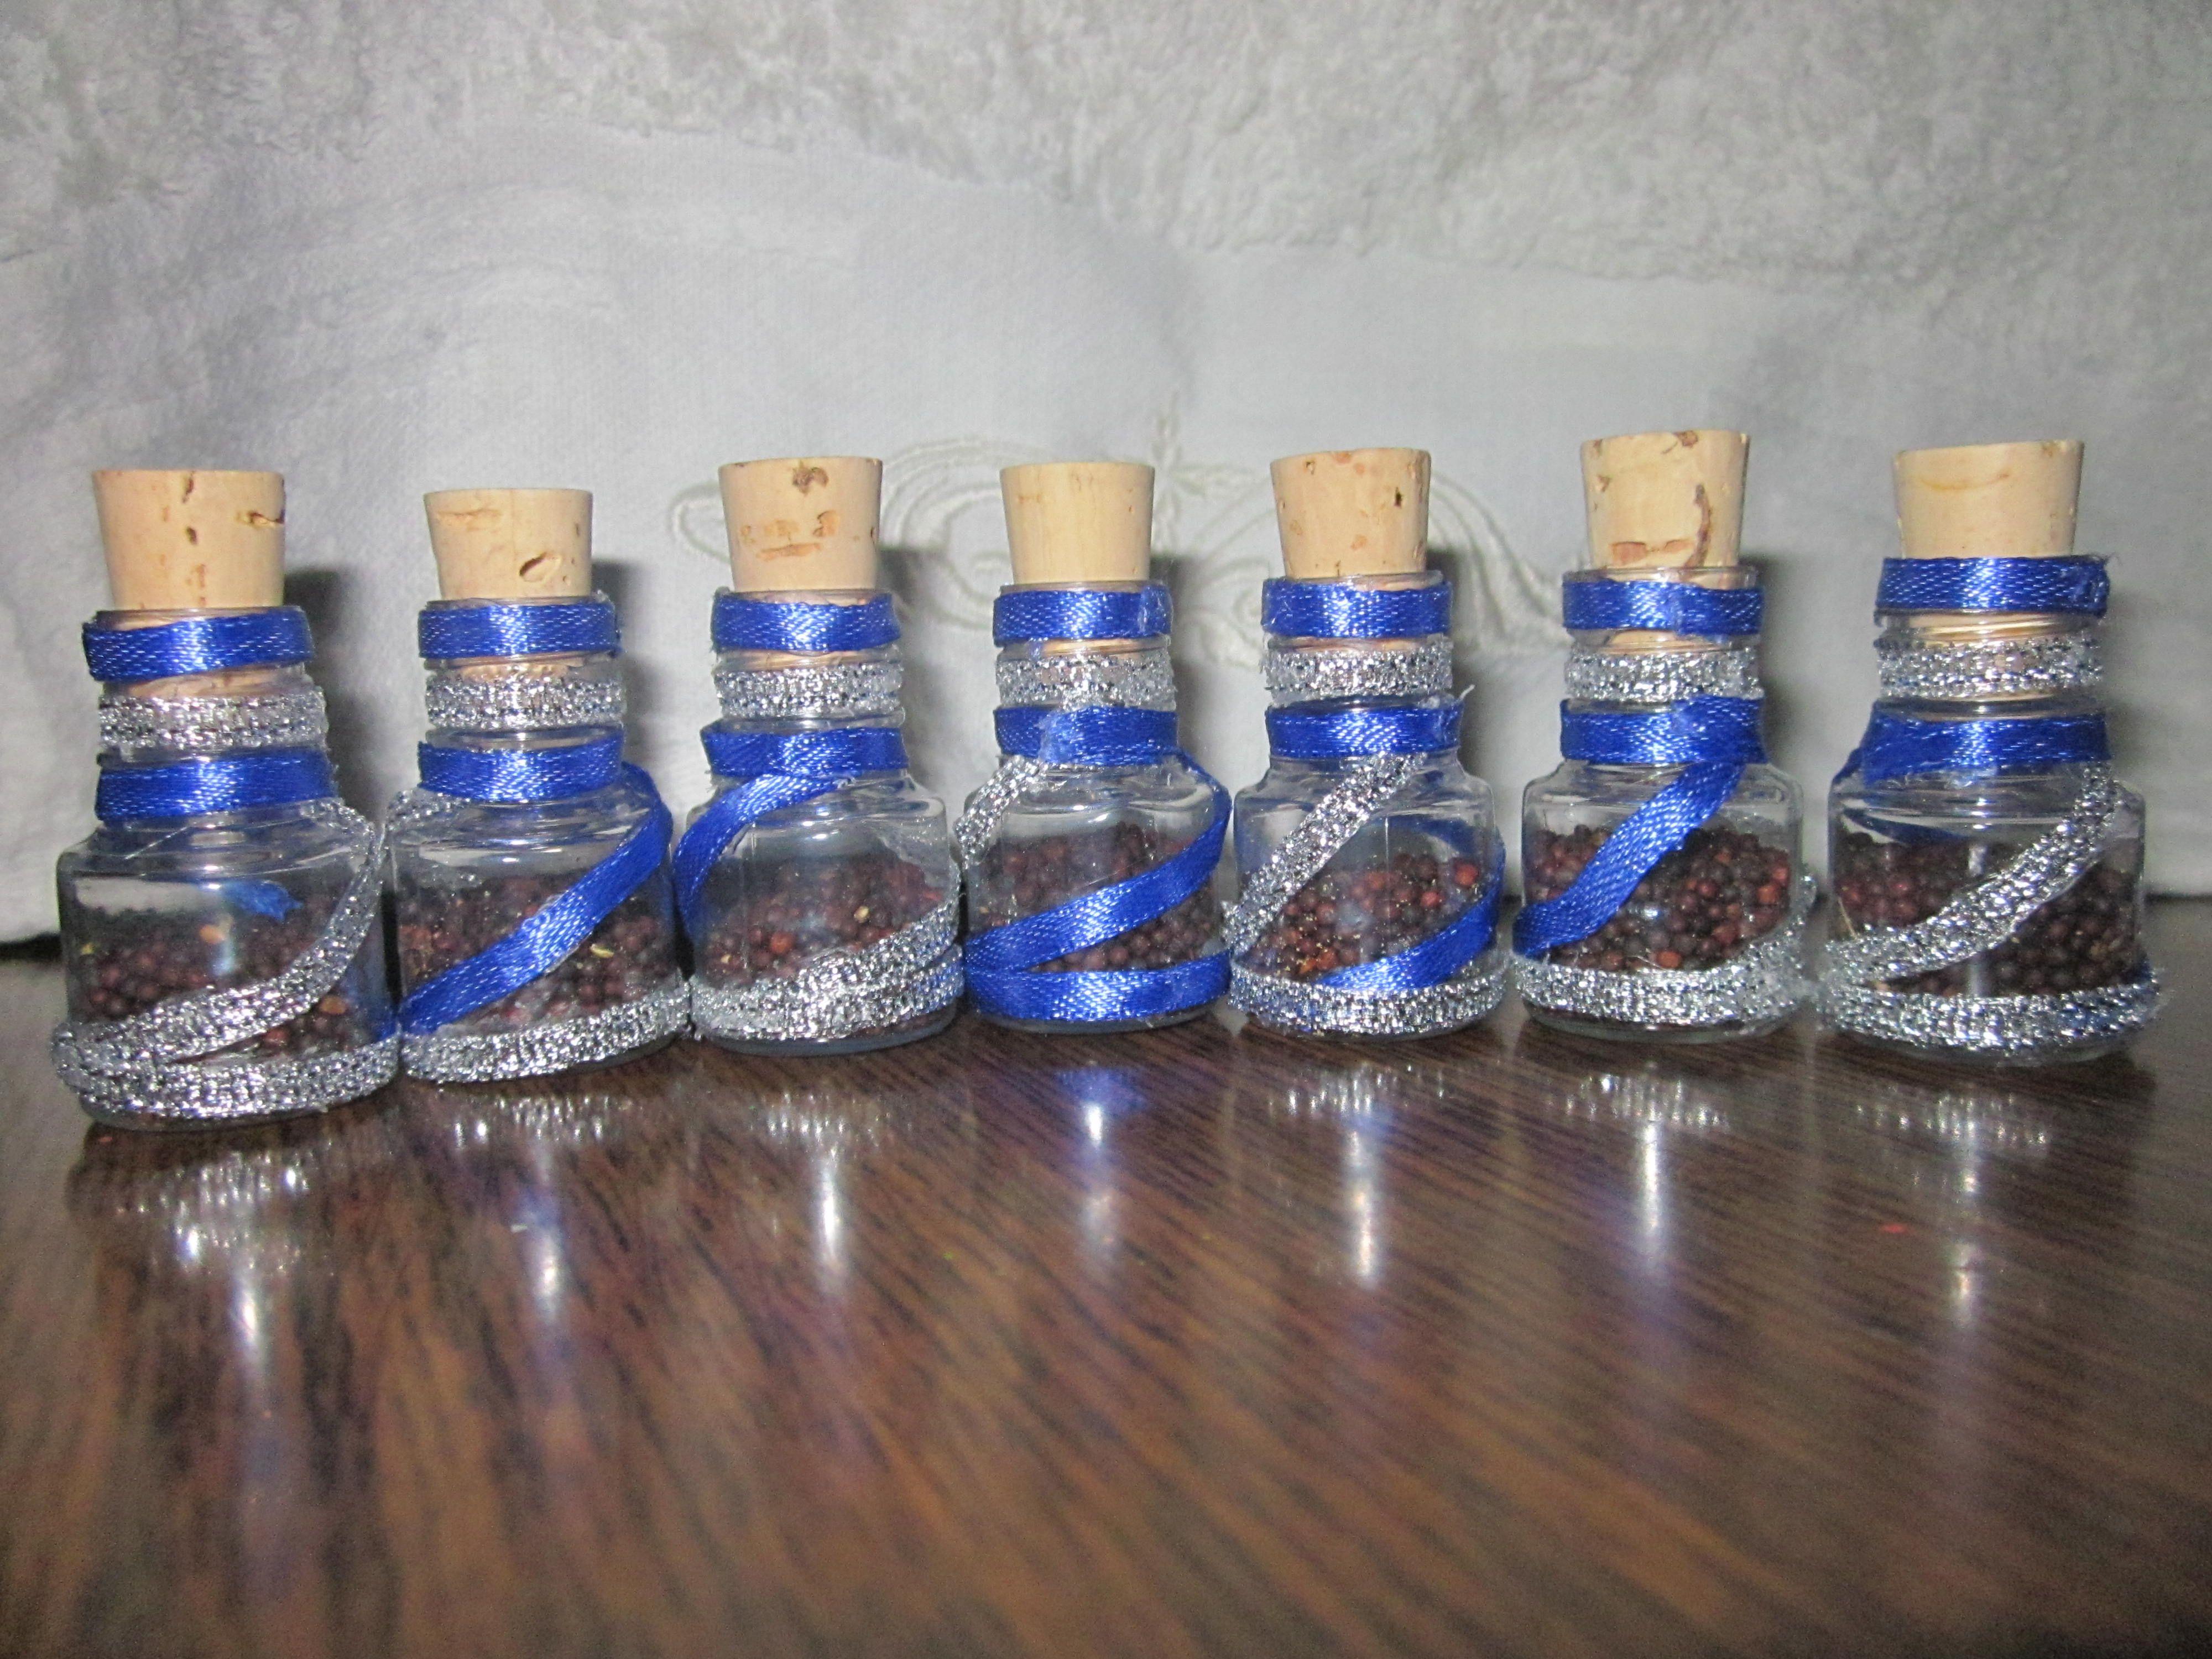 Souvenir en peque os frascos decorados con list n y - Comprar tarros de cristal pequenos ...